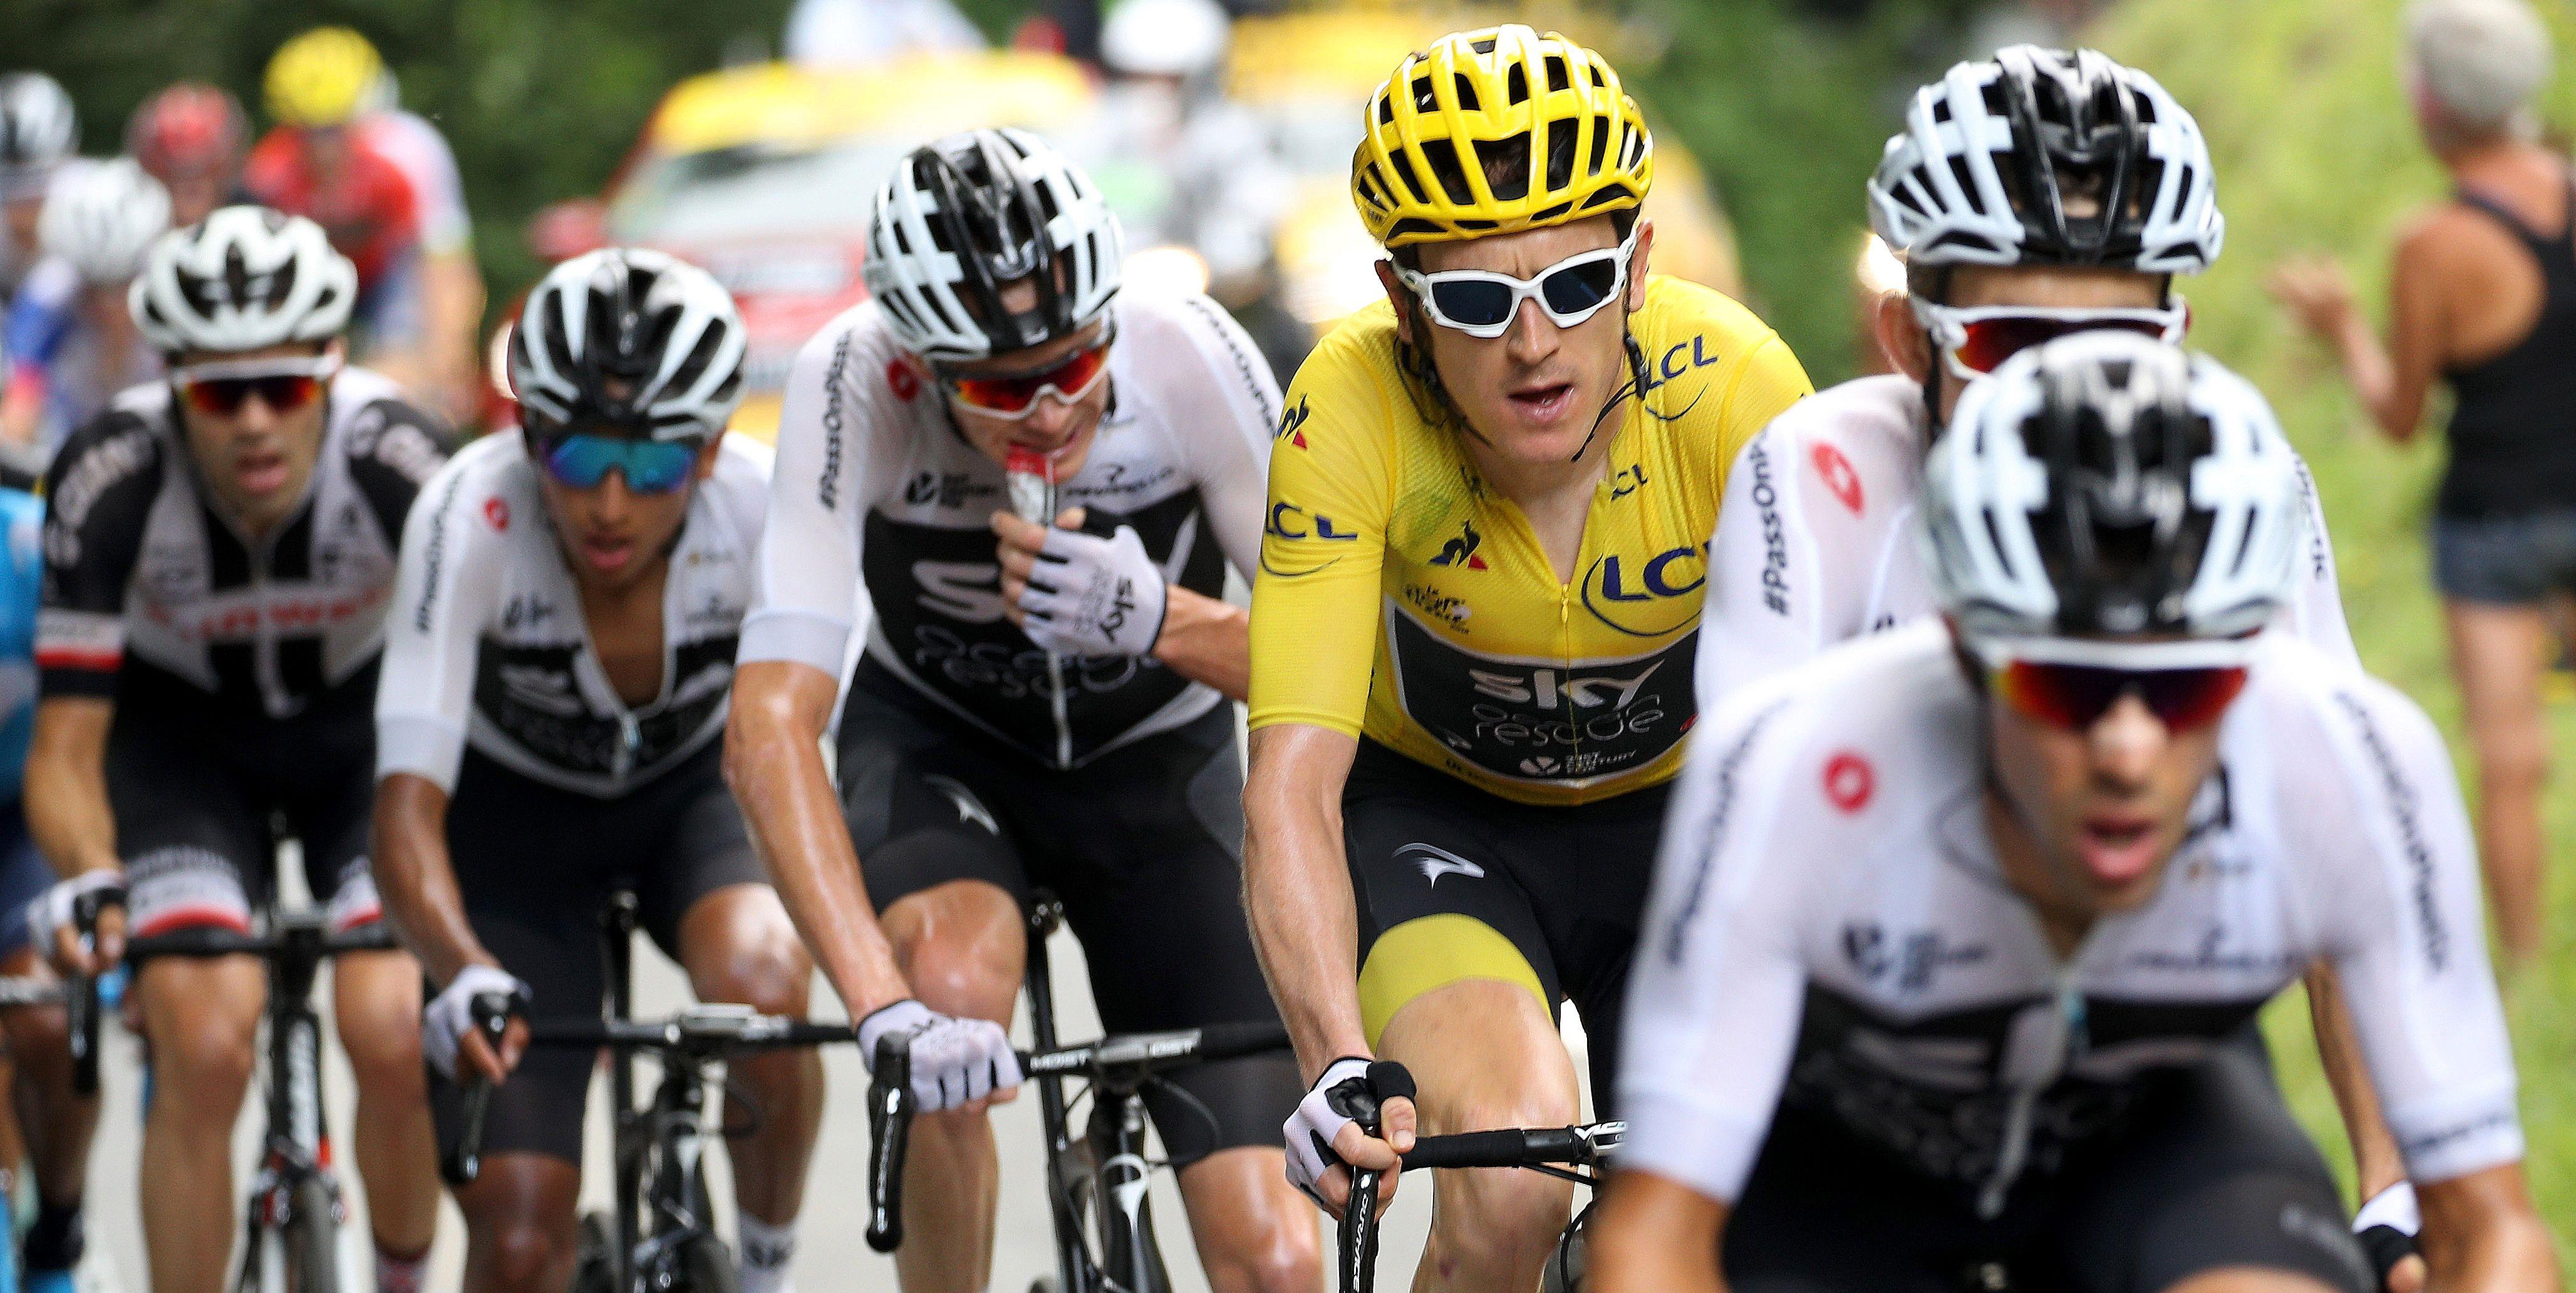 Cycling: 105th Tour de France 2018 / Stage 17